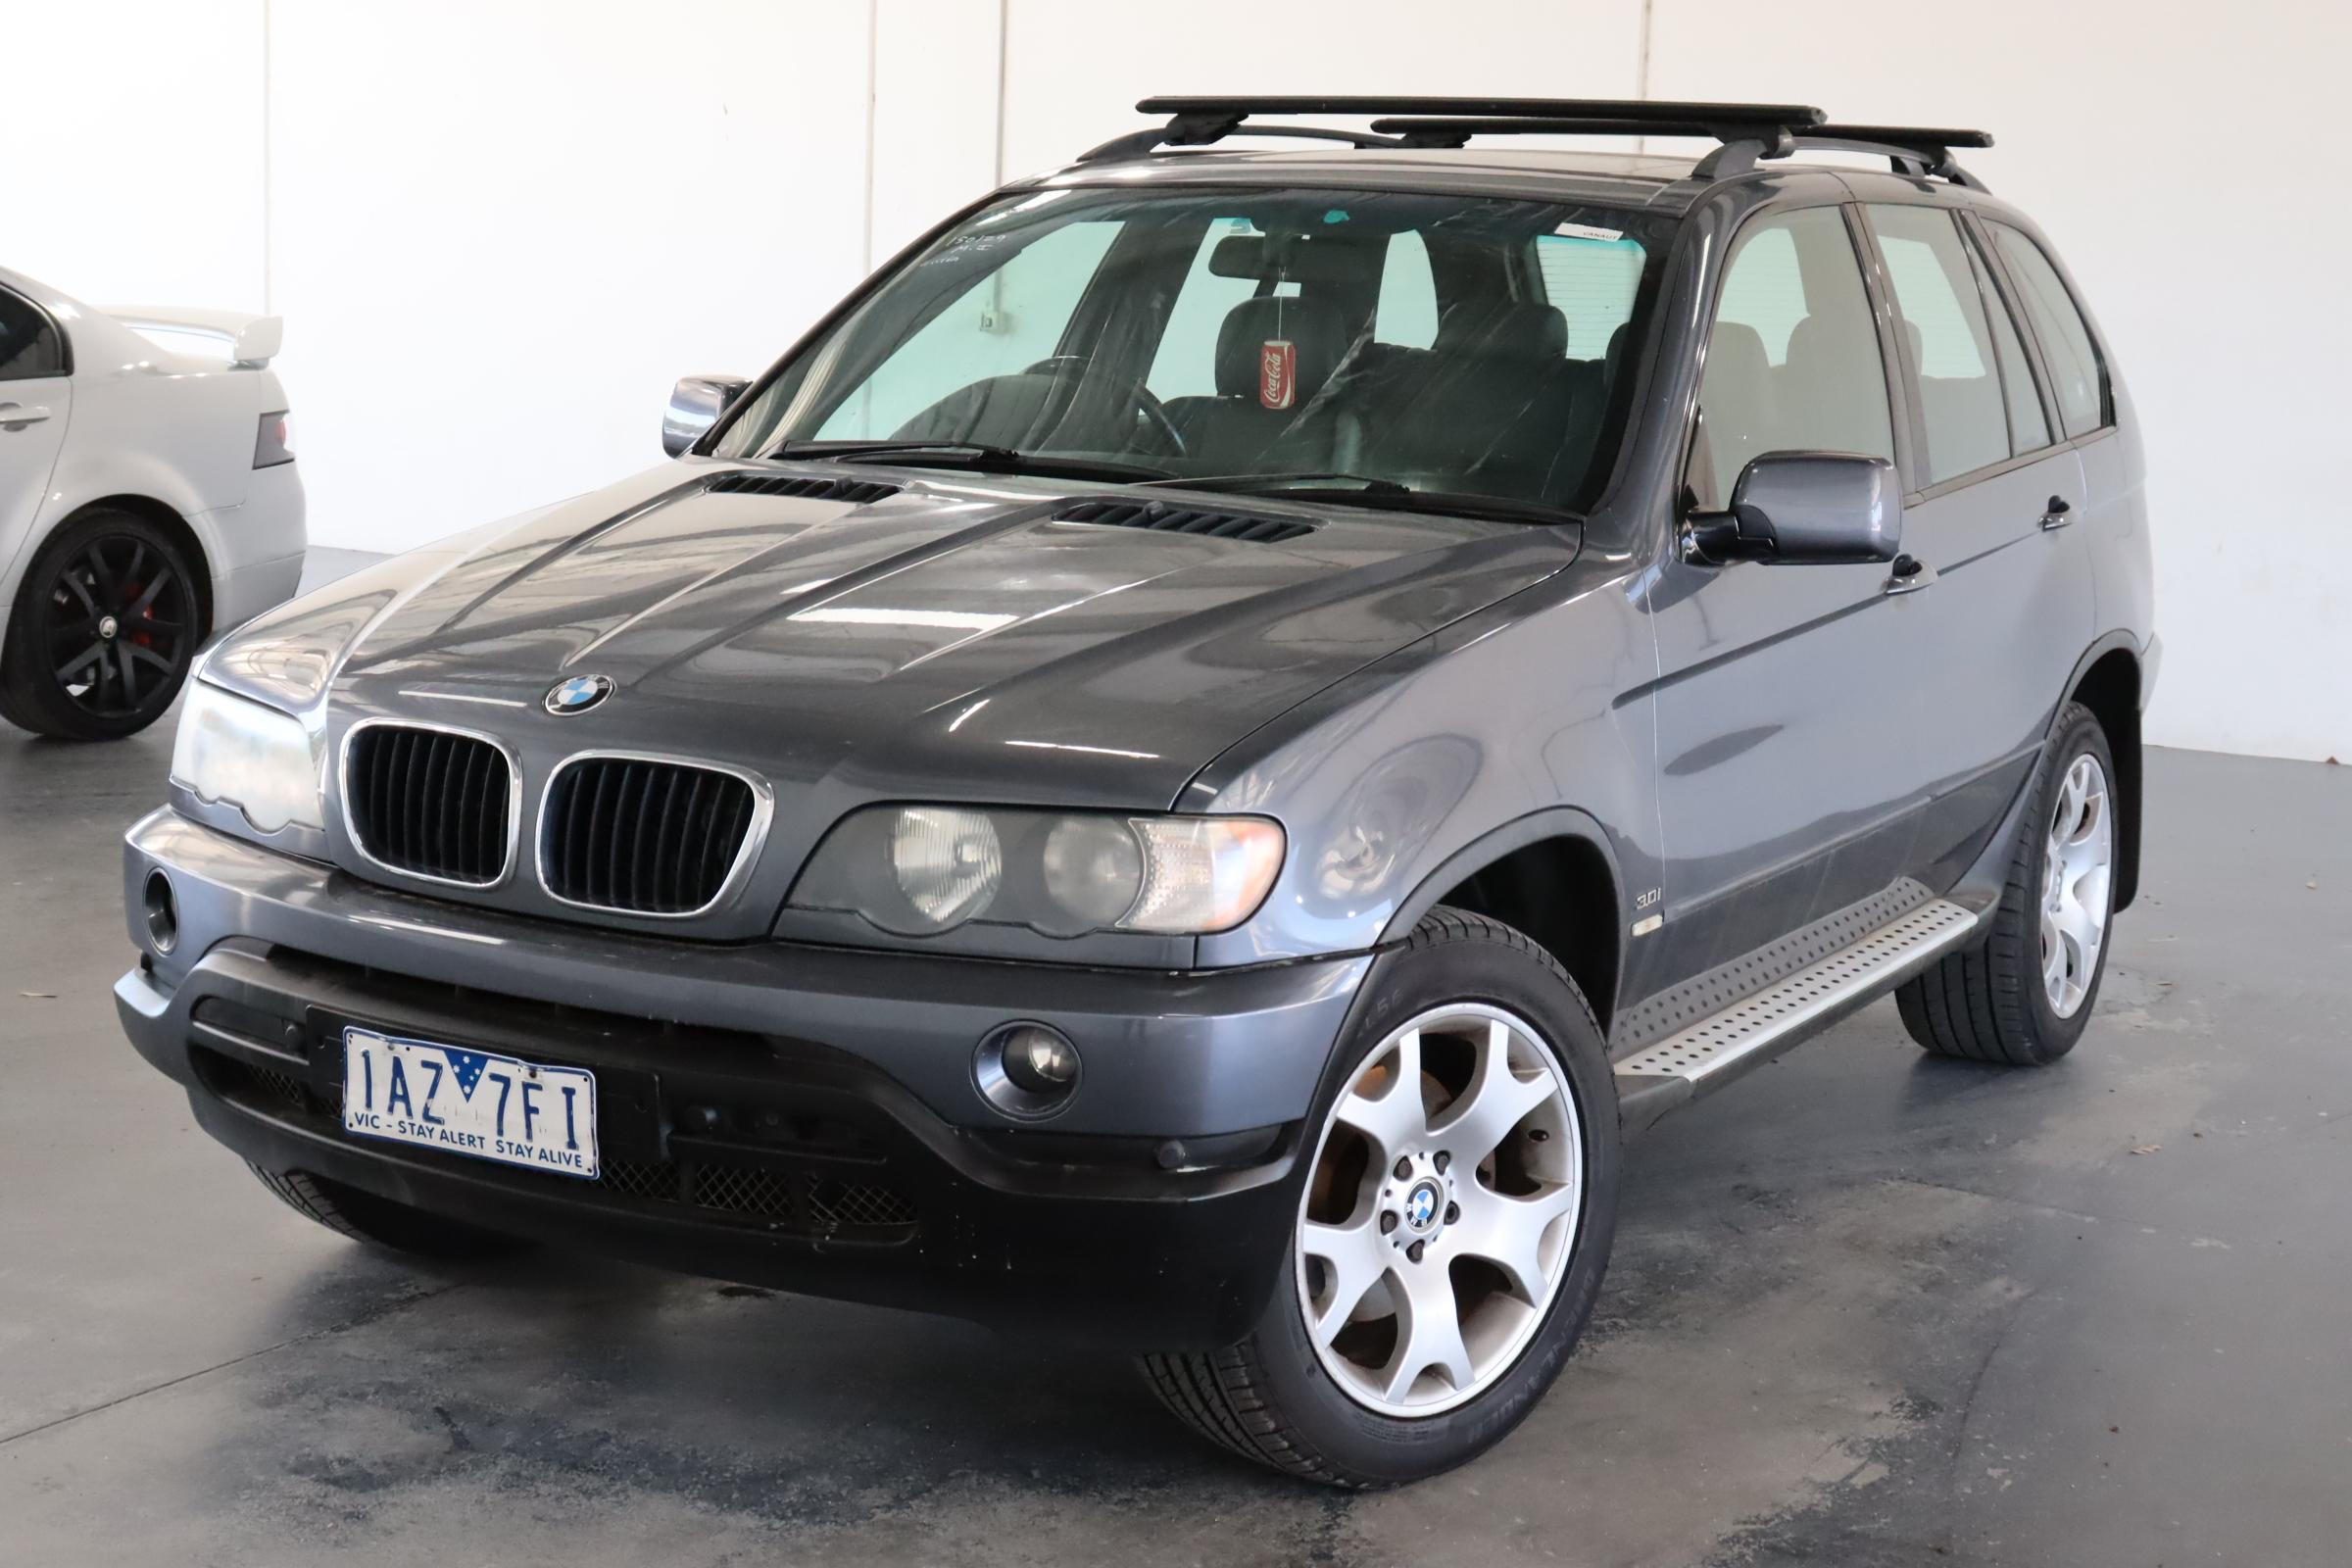 2002 BMW X5 3.0i E53 Automatic Wagon